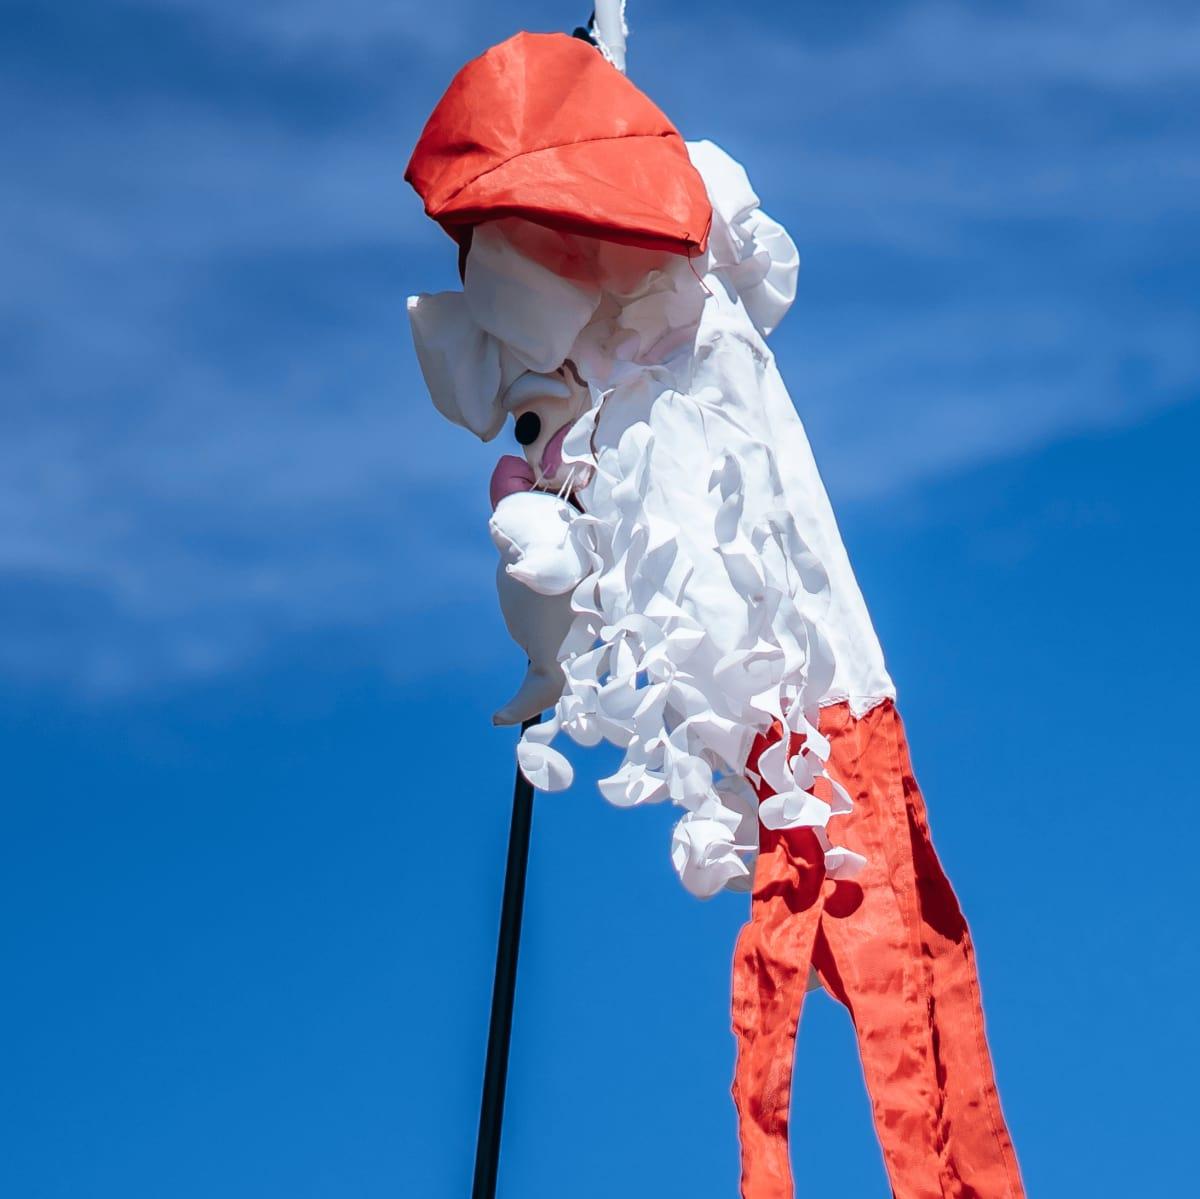 ACL Austin City Limits Music Festival 2016 flags Santa Claus